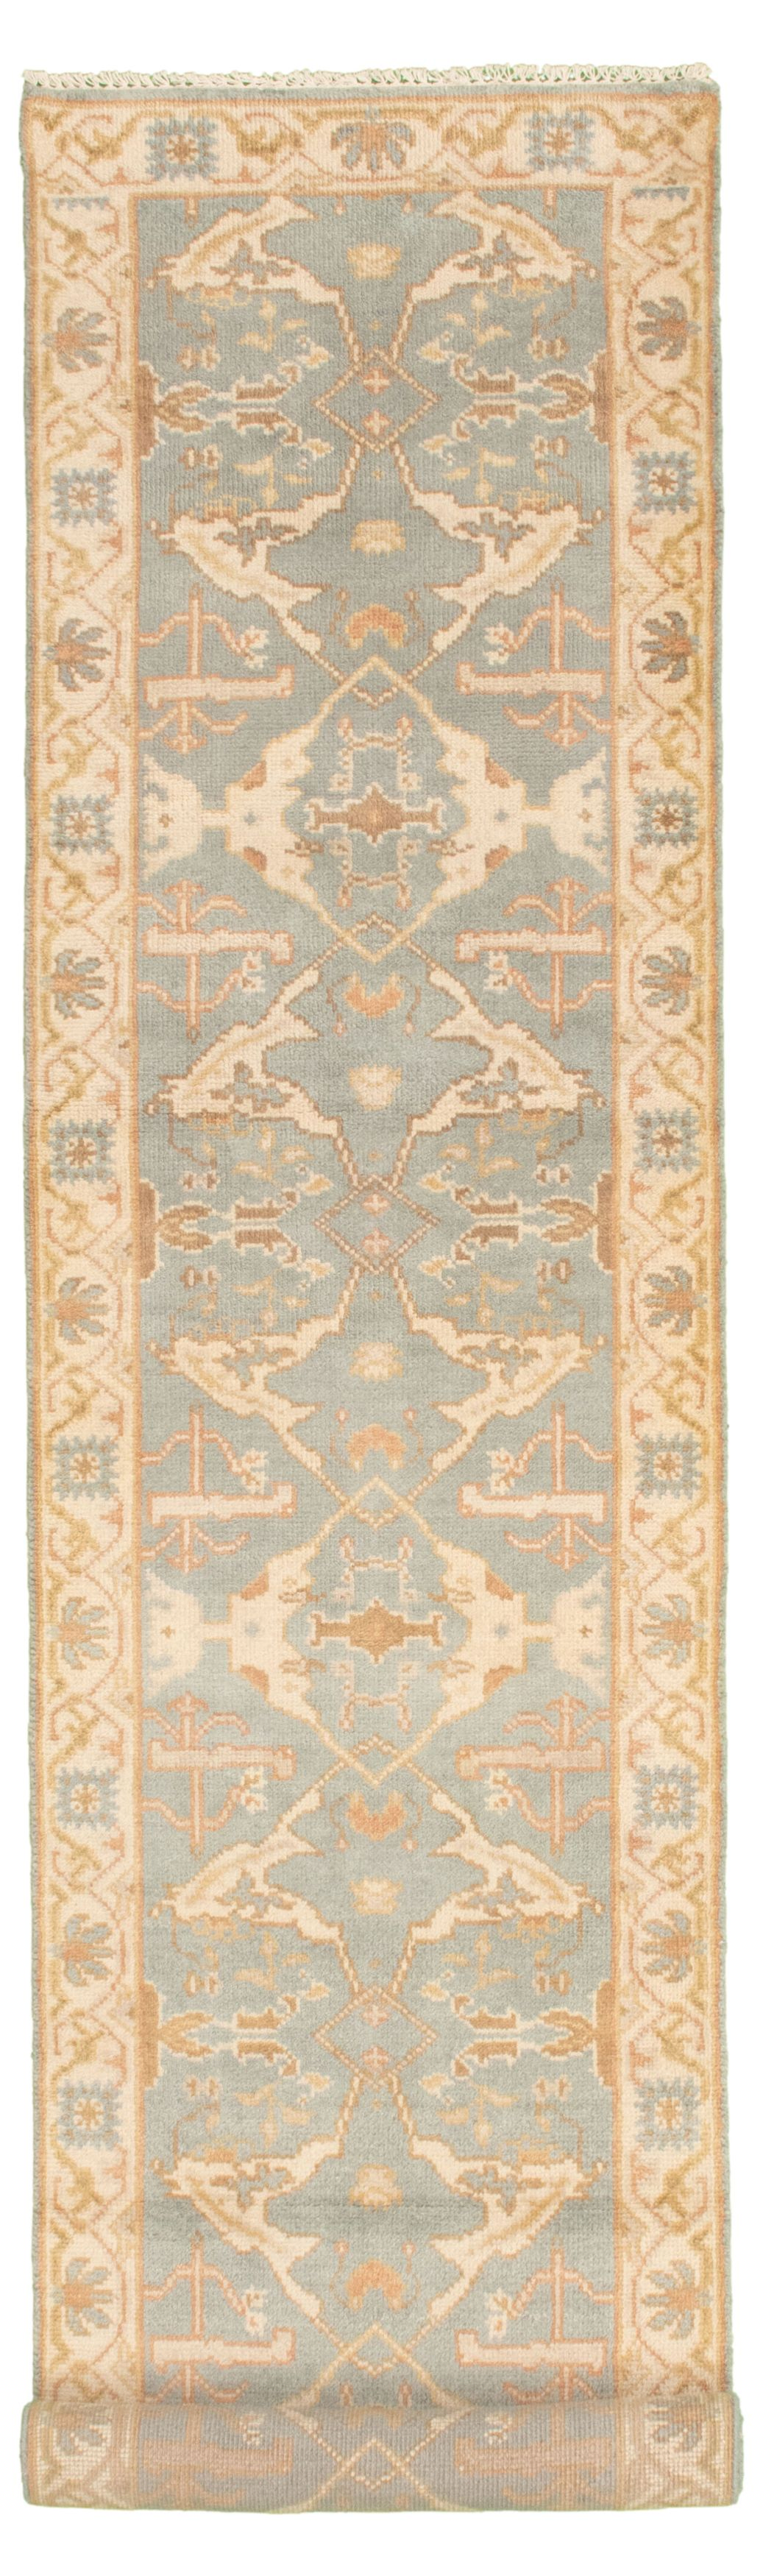 "Hand-knotted Royal Ushak Light Denim Blue Wool Rug 2'7"" x 11'10"" Size: 2'7"" x 11'10"""